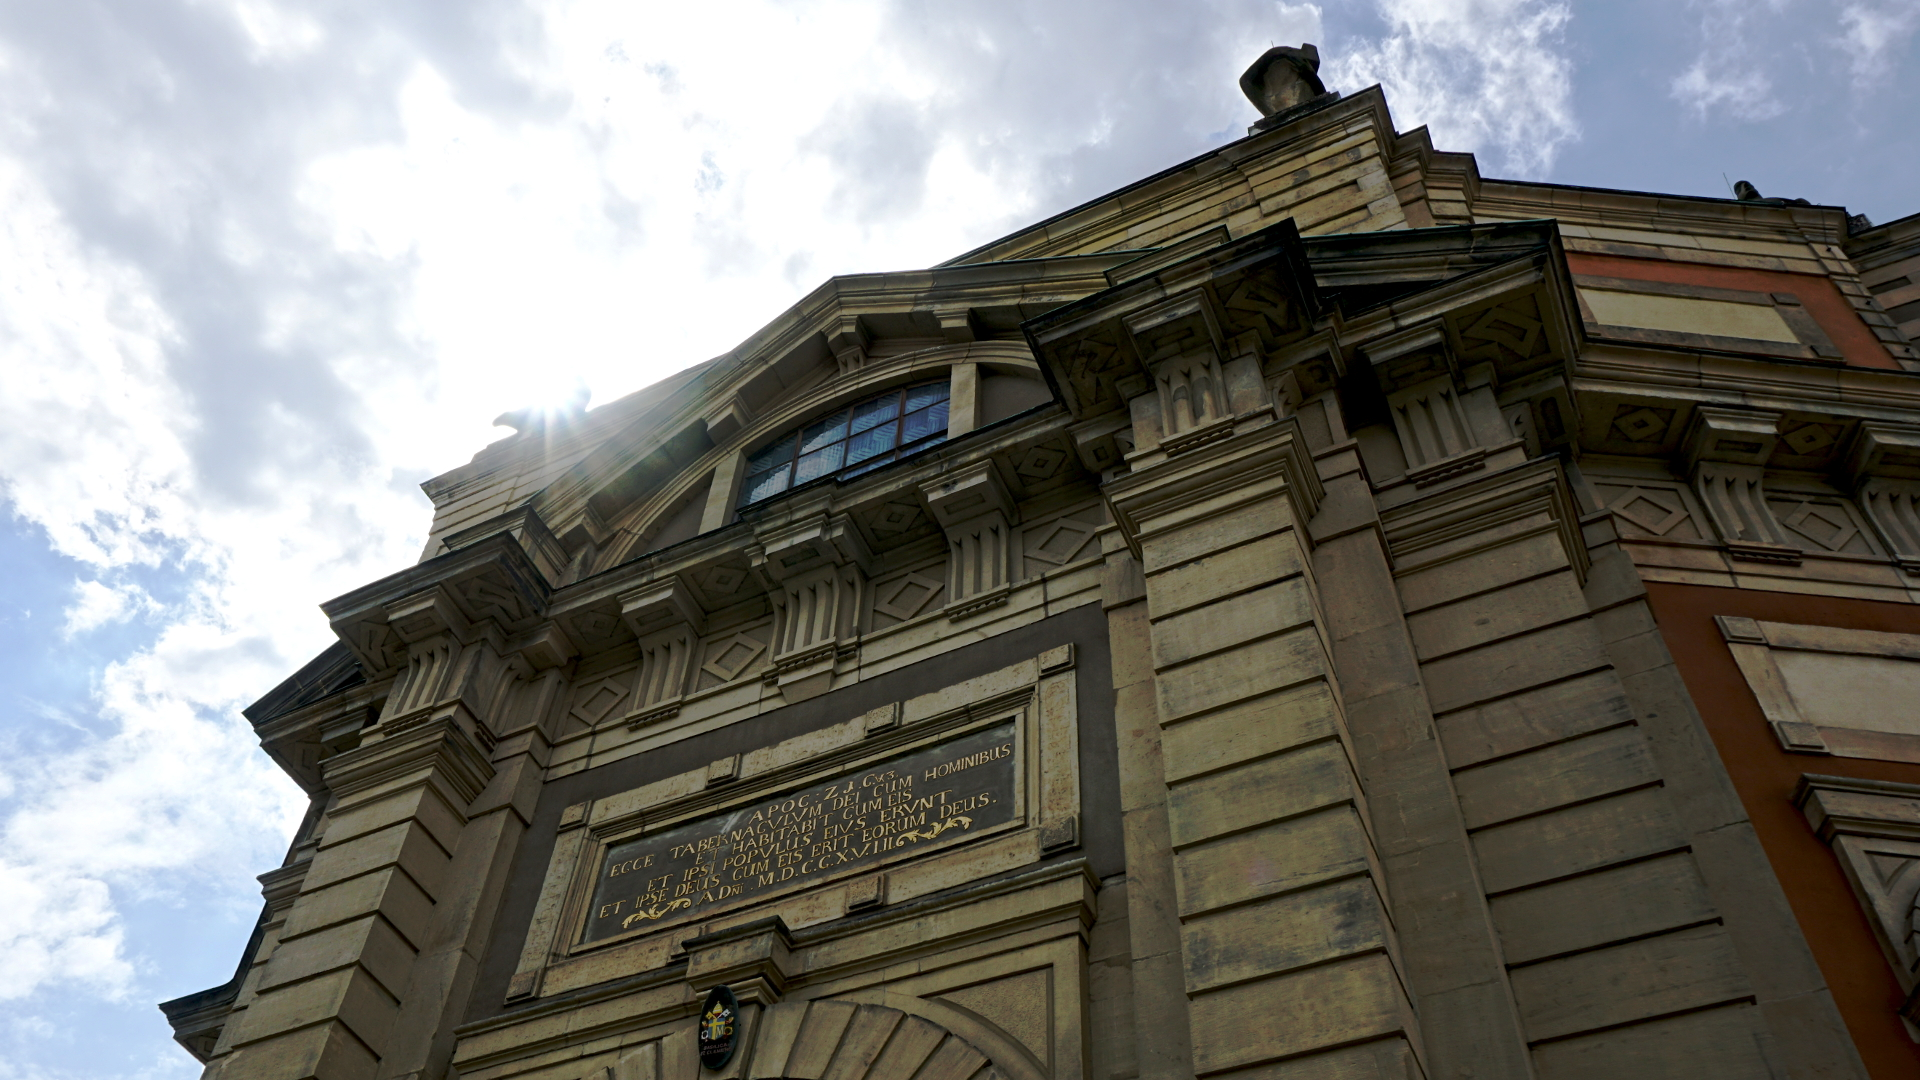 Kirchenfront von St. Clemens, Hannover — Experiment